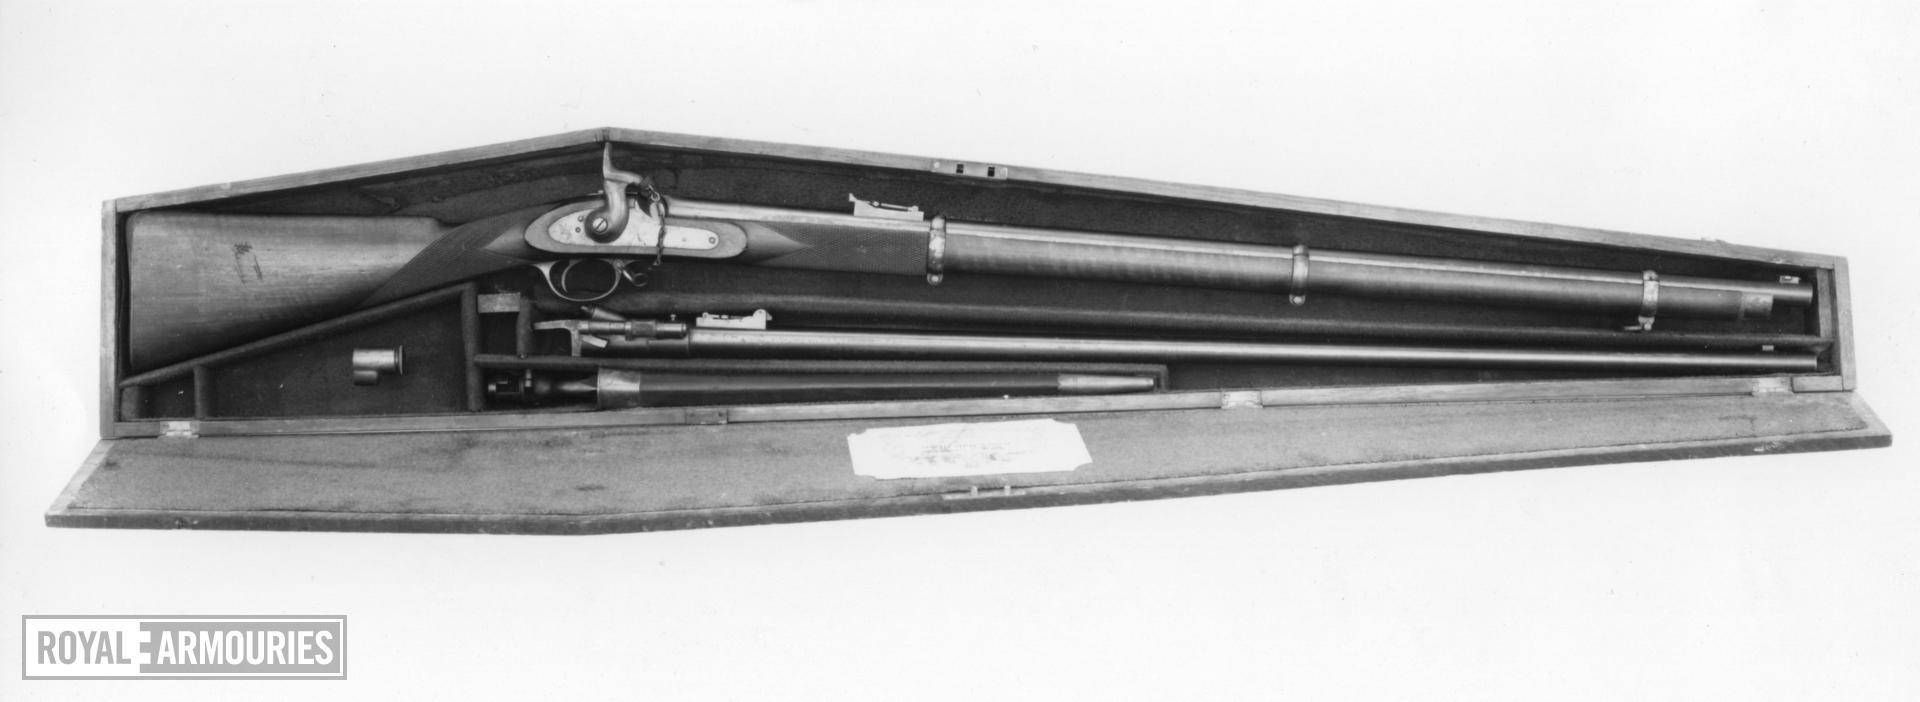 Percussion target rifle - Kerr rifle